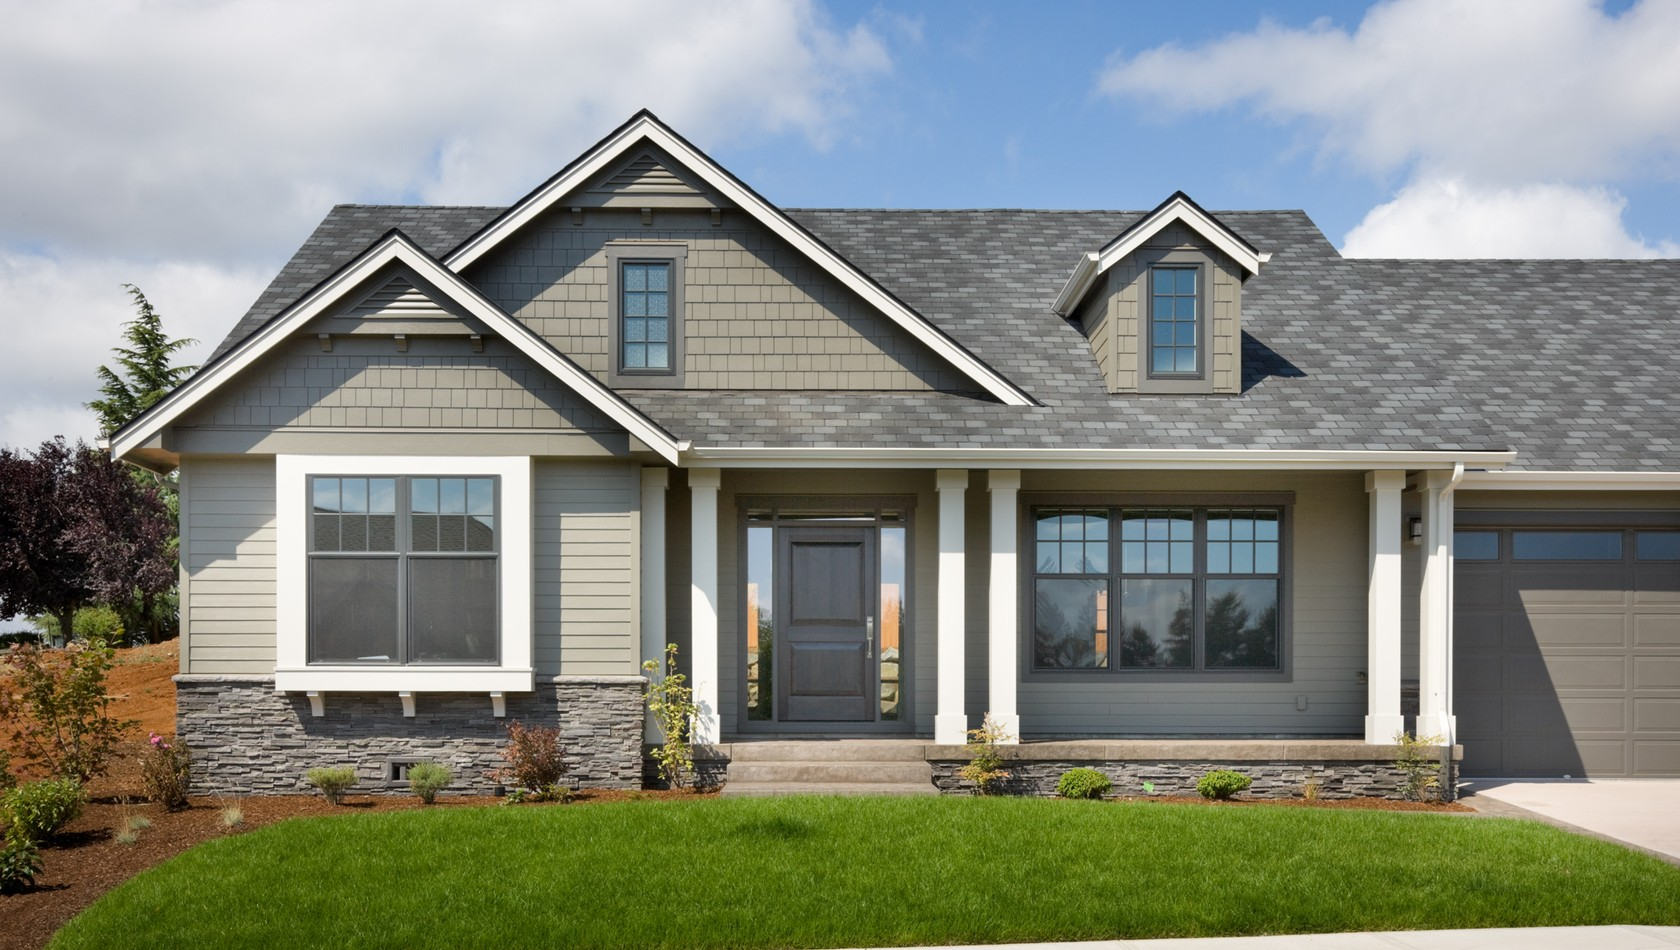 Mascord House Plan 22158: The Willard